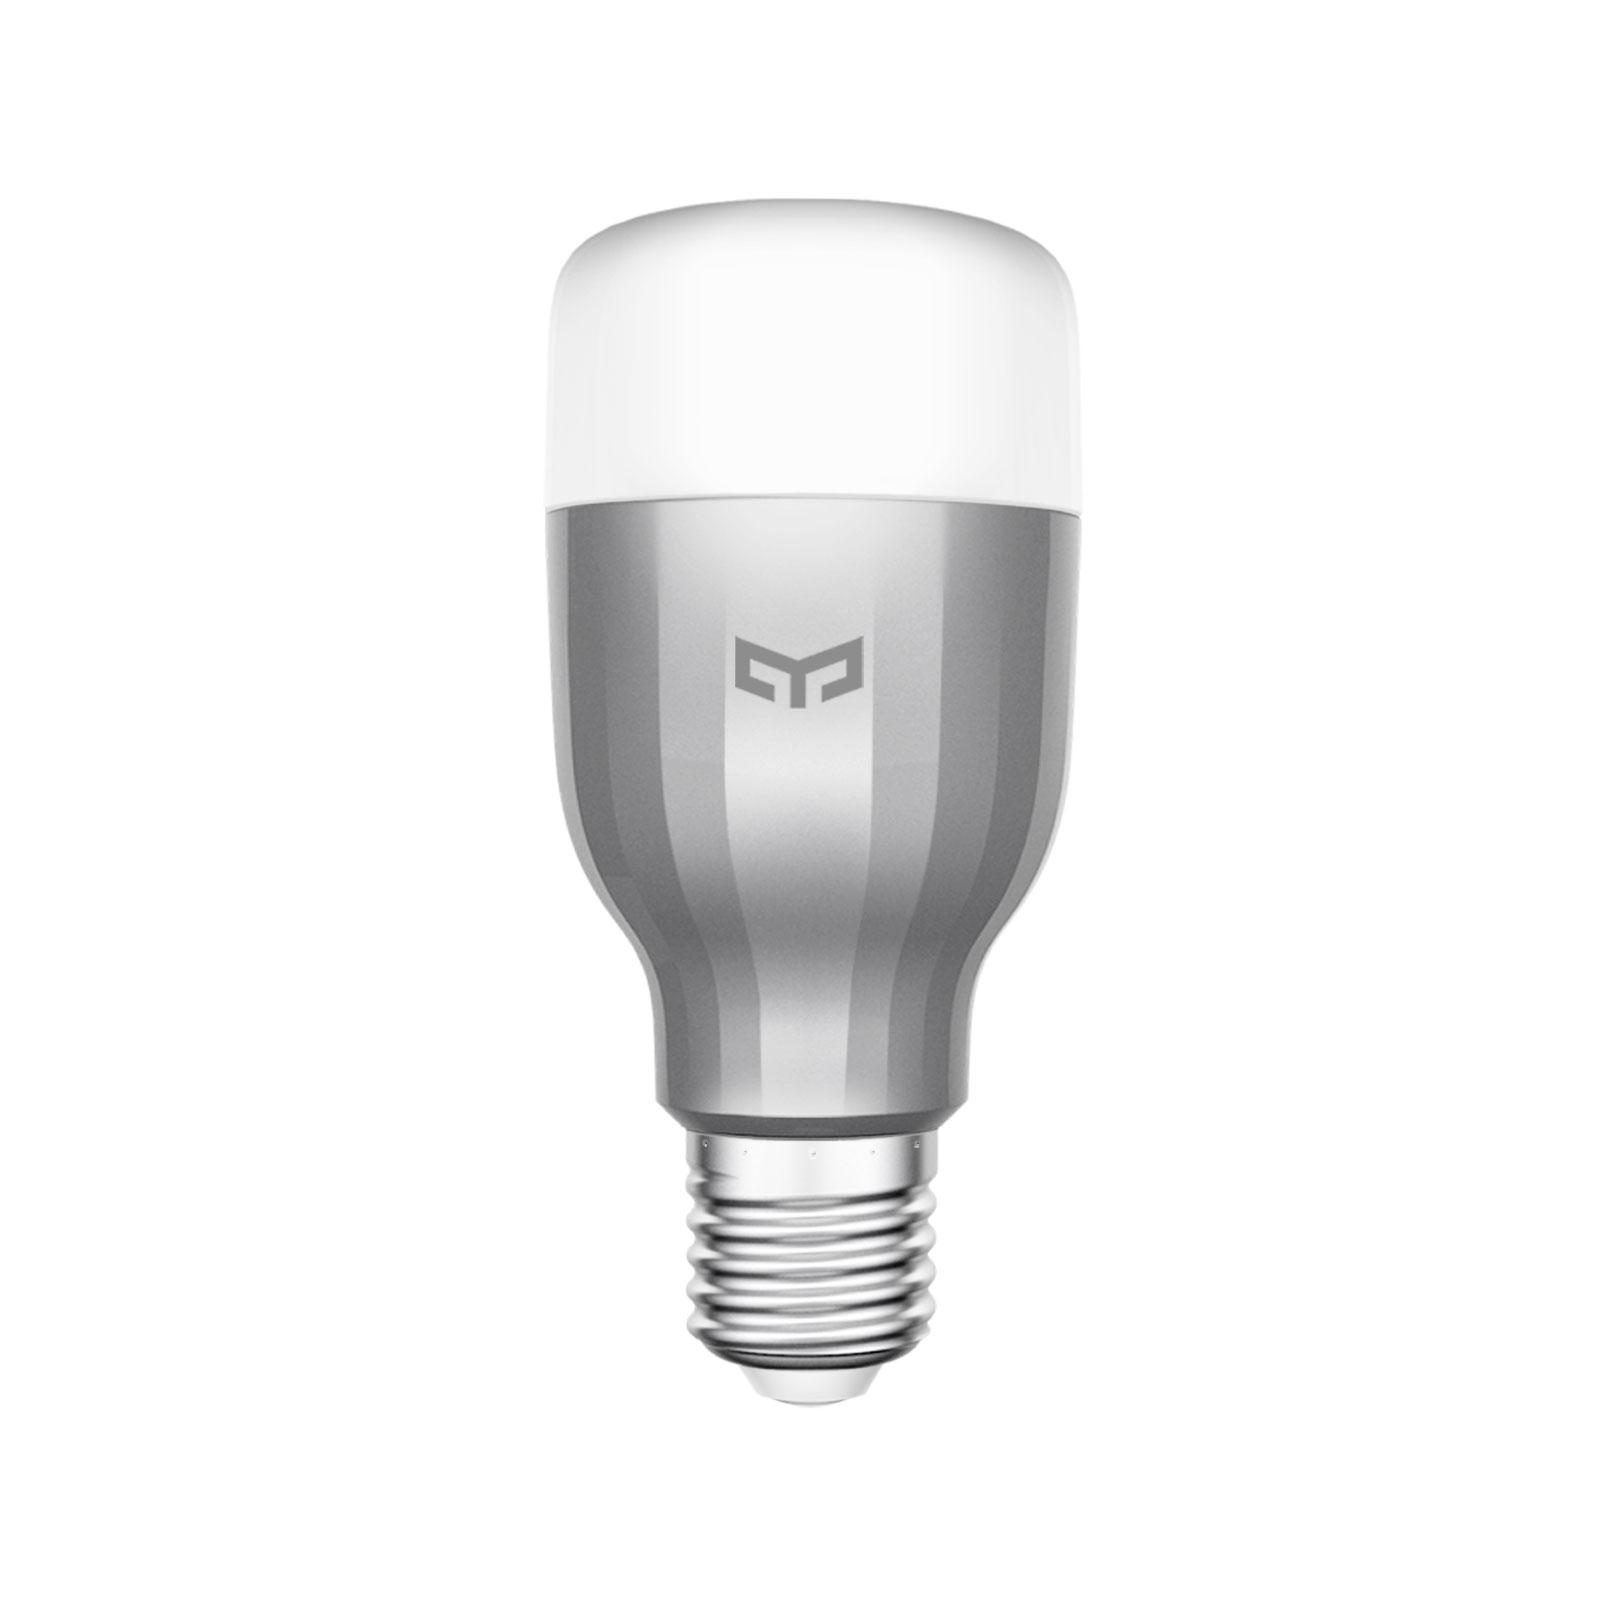 Yeelight LED 智能燈泡 - 小米香港官網